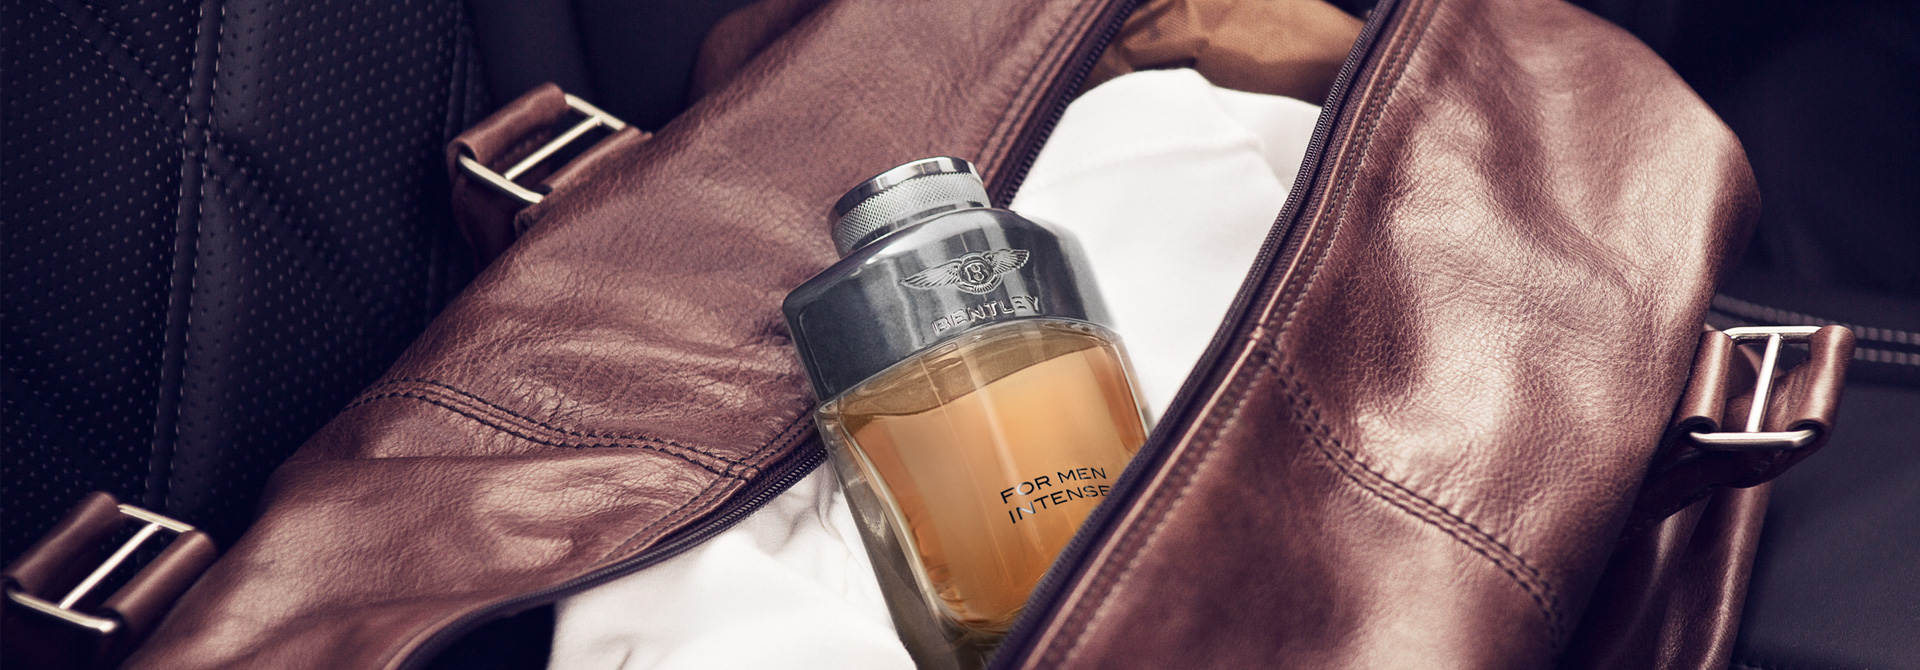 Bentley Fragrances | A bit of history